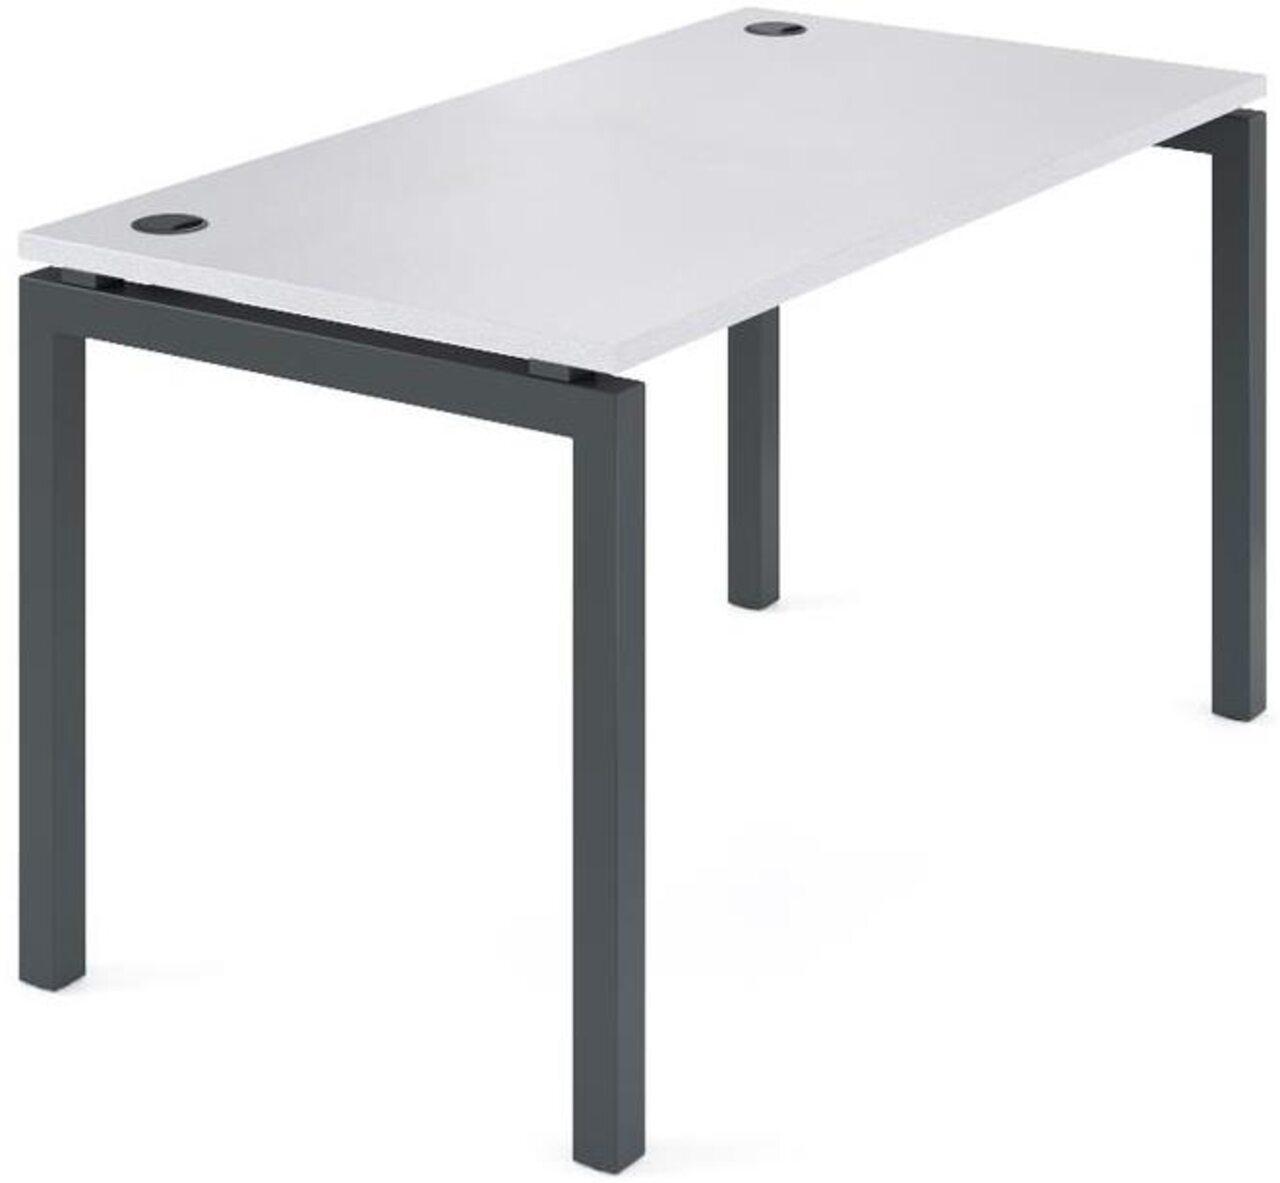 Стол на металлокаркасе  Арго 140x73x76 - фото 3